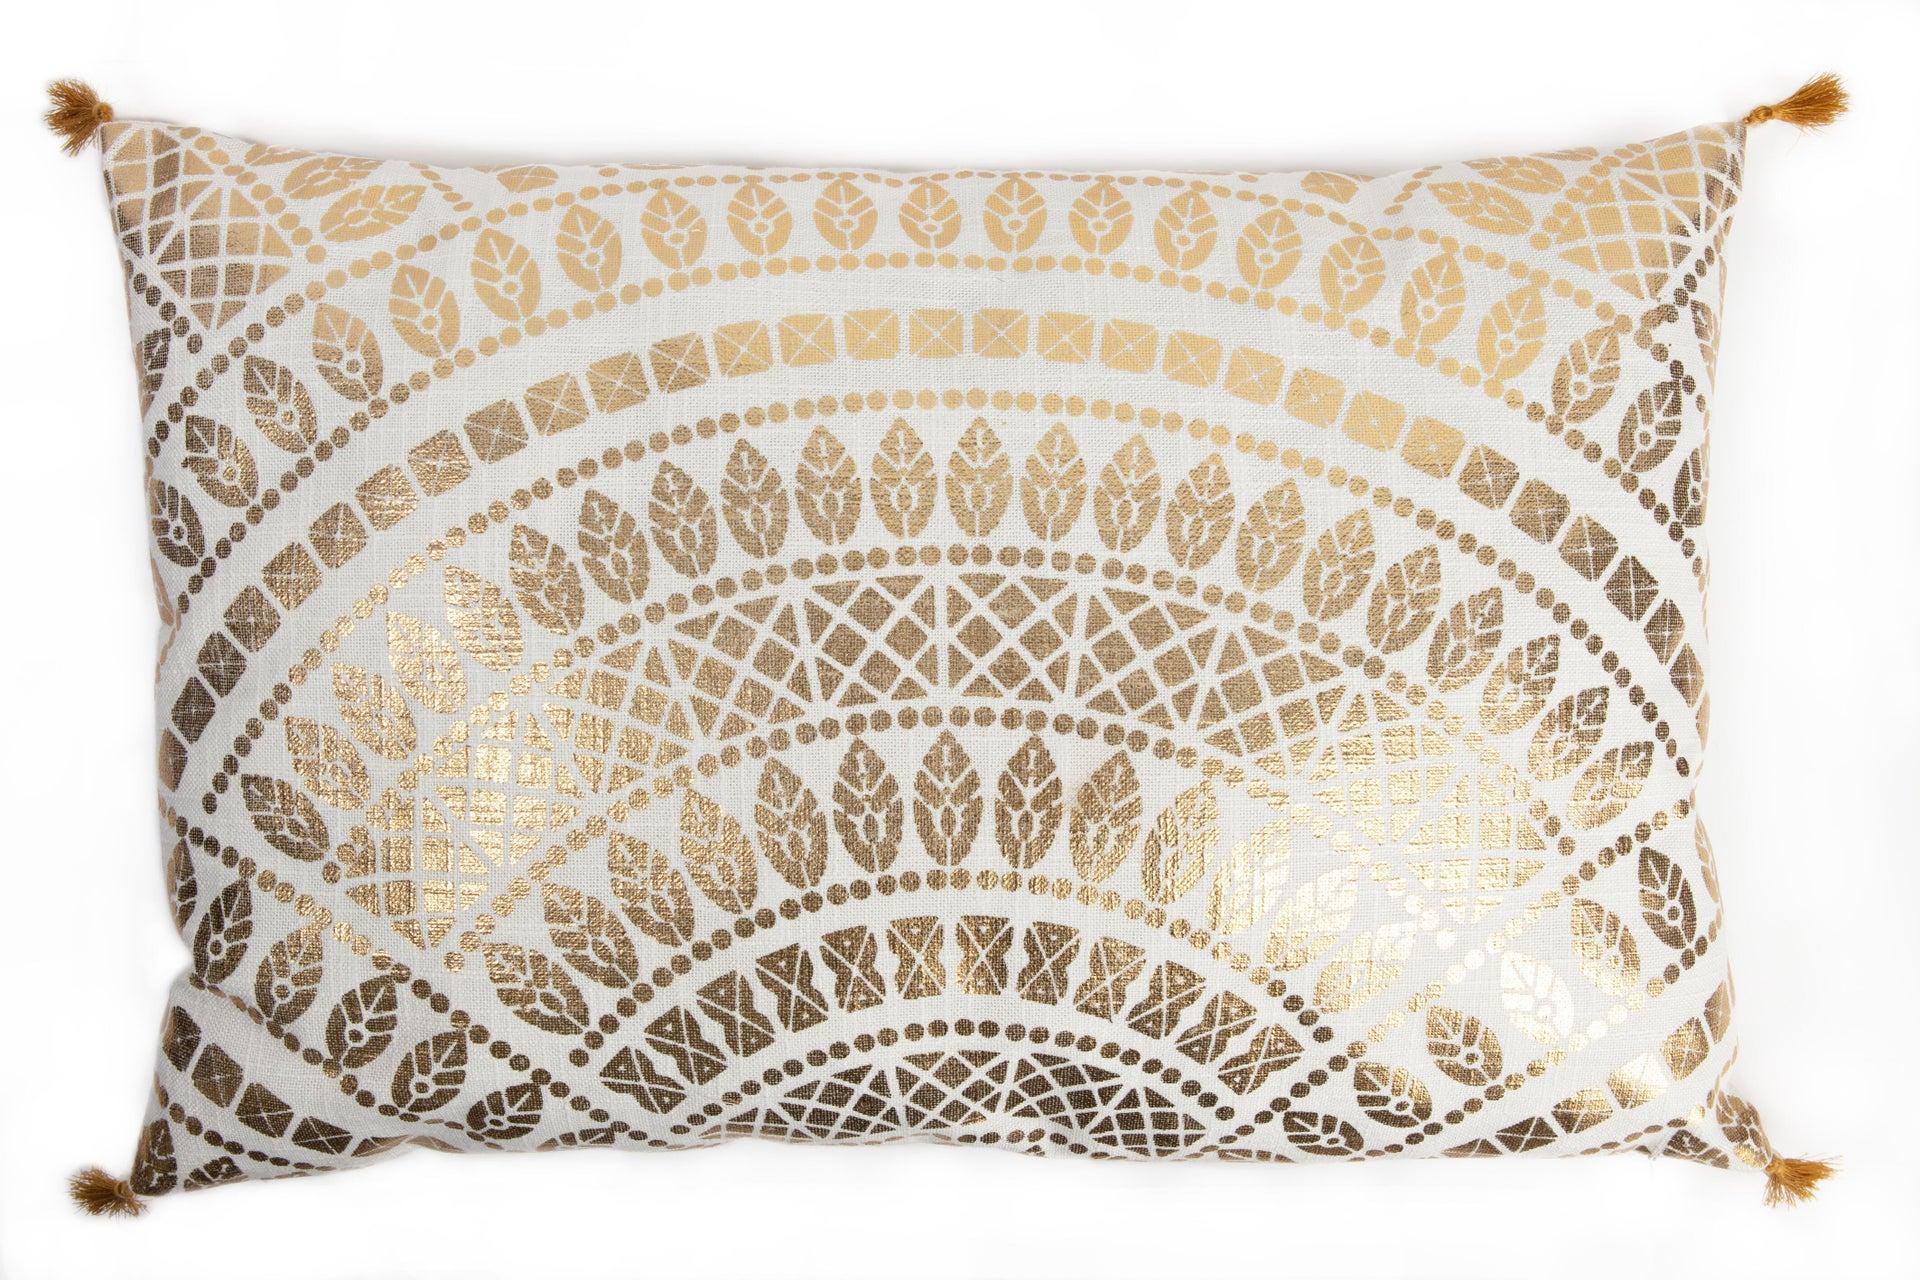 Cuscino Marmore bianco 40x40 cm